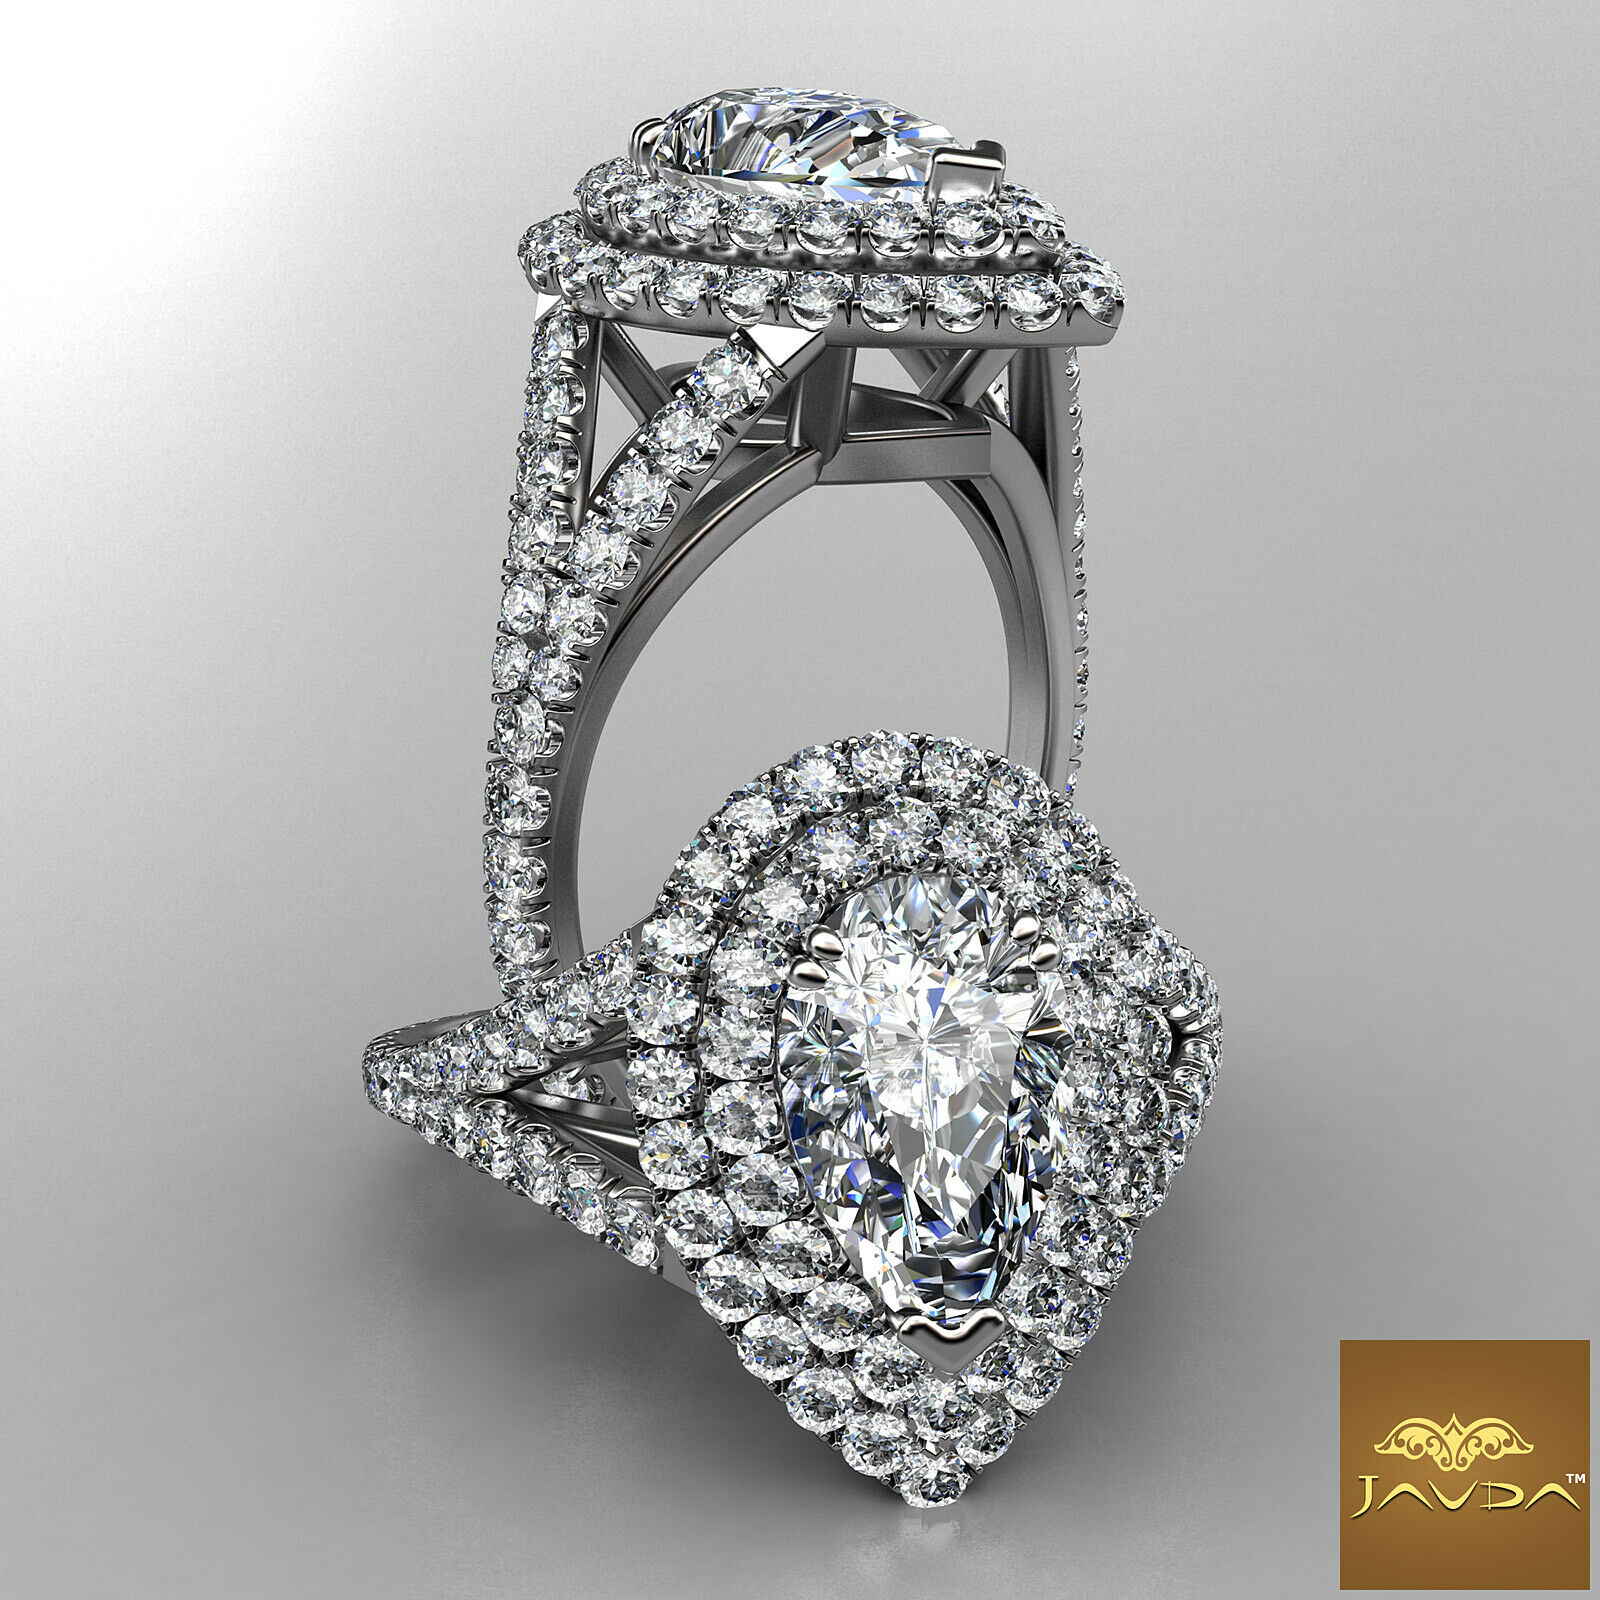 2.23ctw Double Halo Cut Prong Pear Diamond  Engagement Ring GIA J-VVS2 w Gold